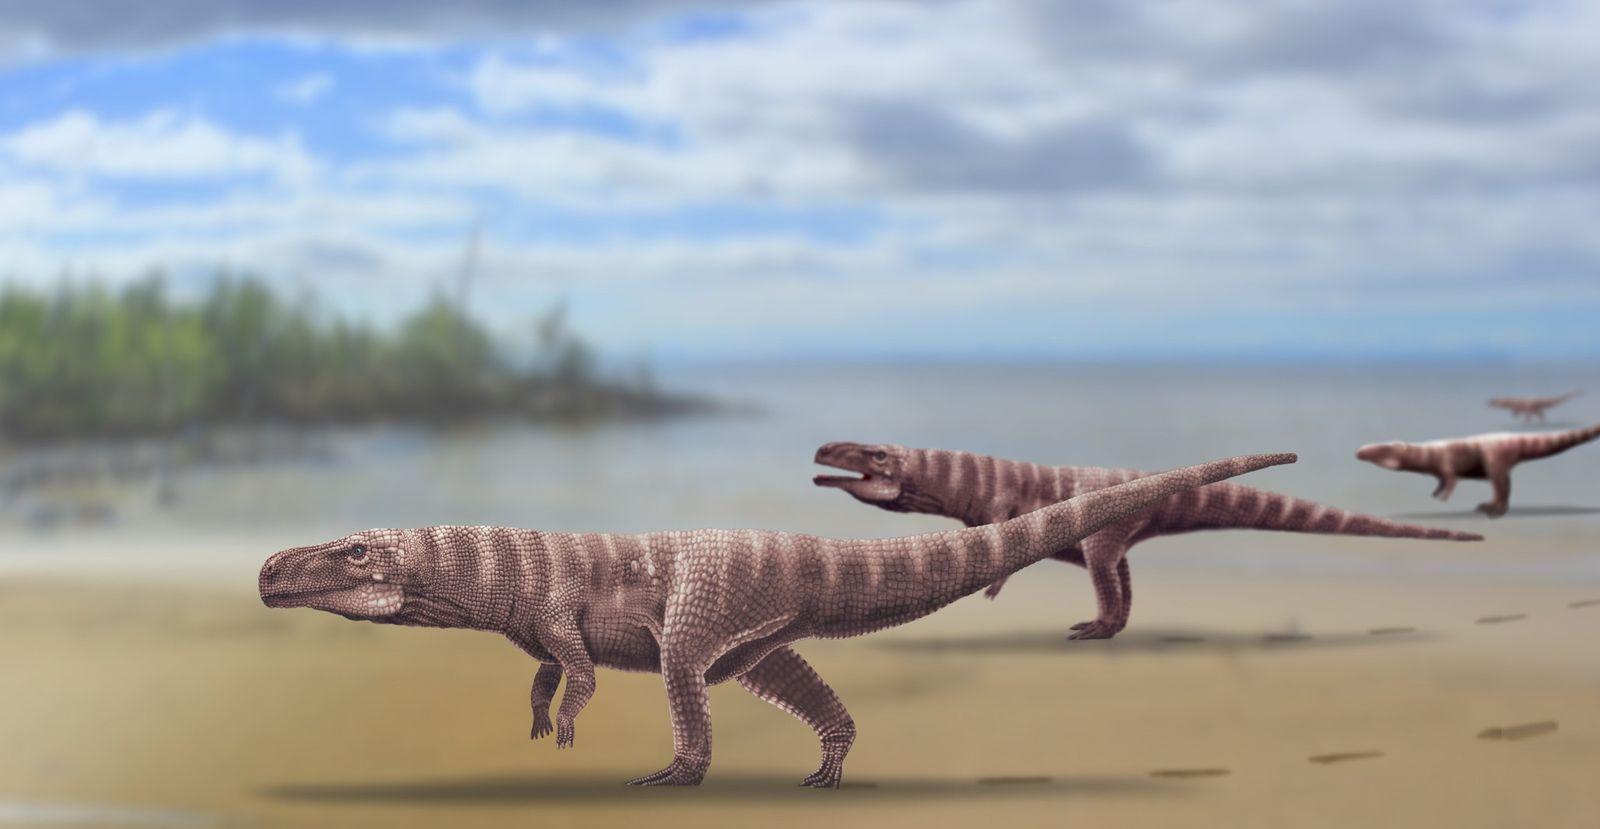 Parente Misterioso de Crocodilo Pode Ter Andado Sobre Duas Patas